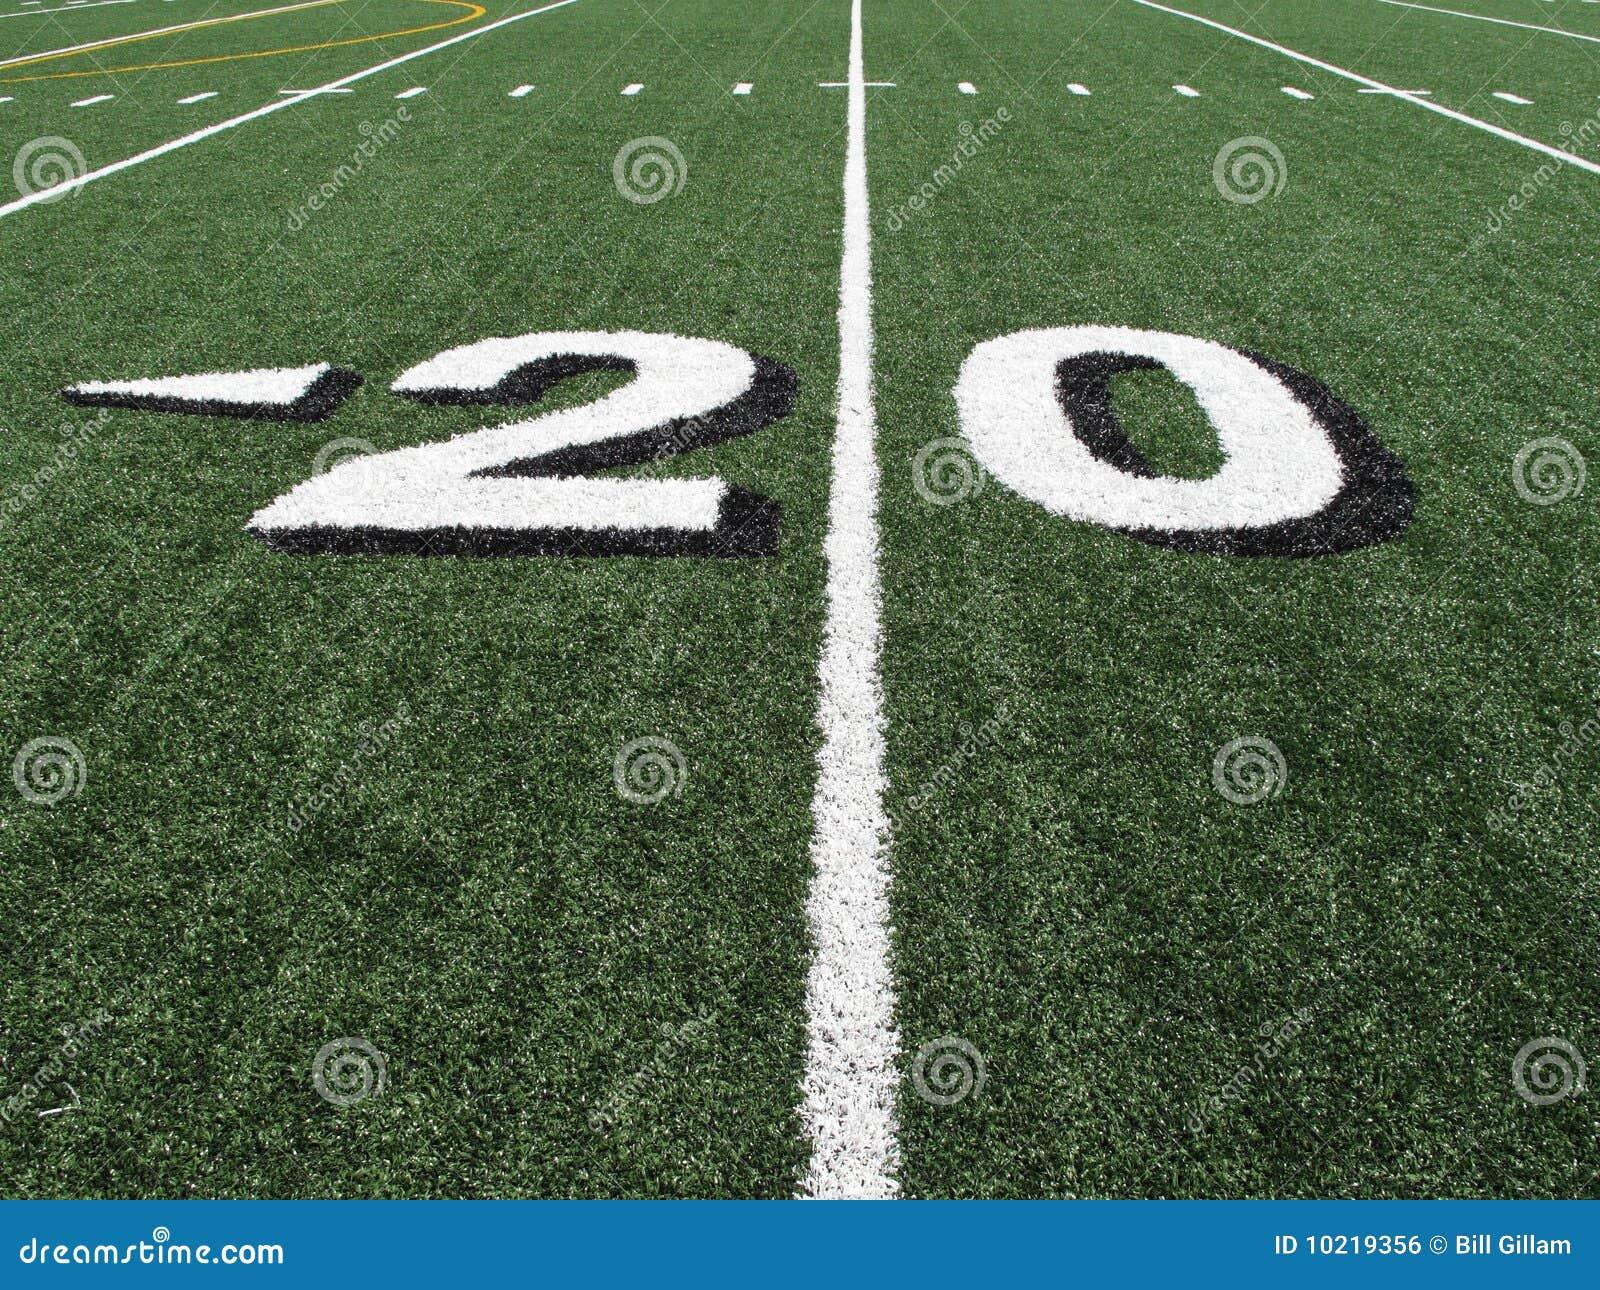 High School Football Field Yardage Marker Stock Photo Image Of